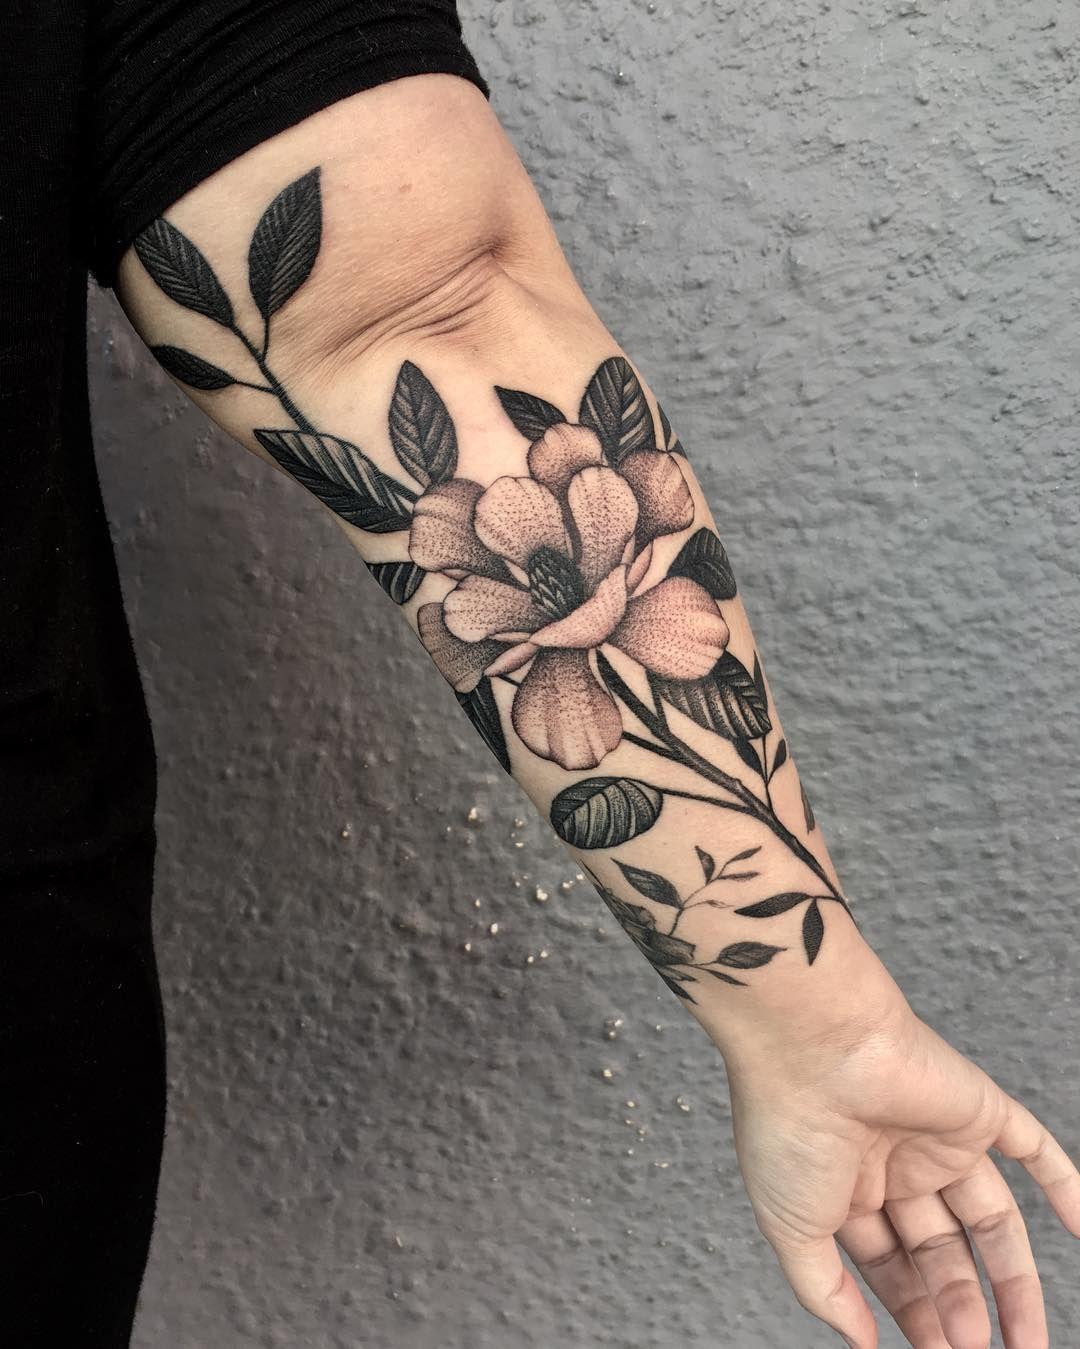 justin olivier Magnolia tattoo, Underarm tattoo, Cover